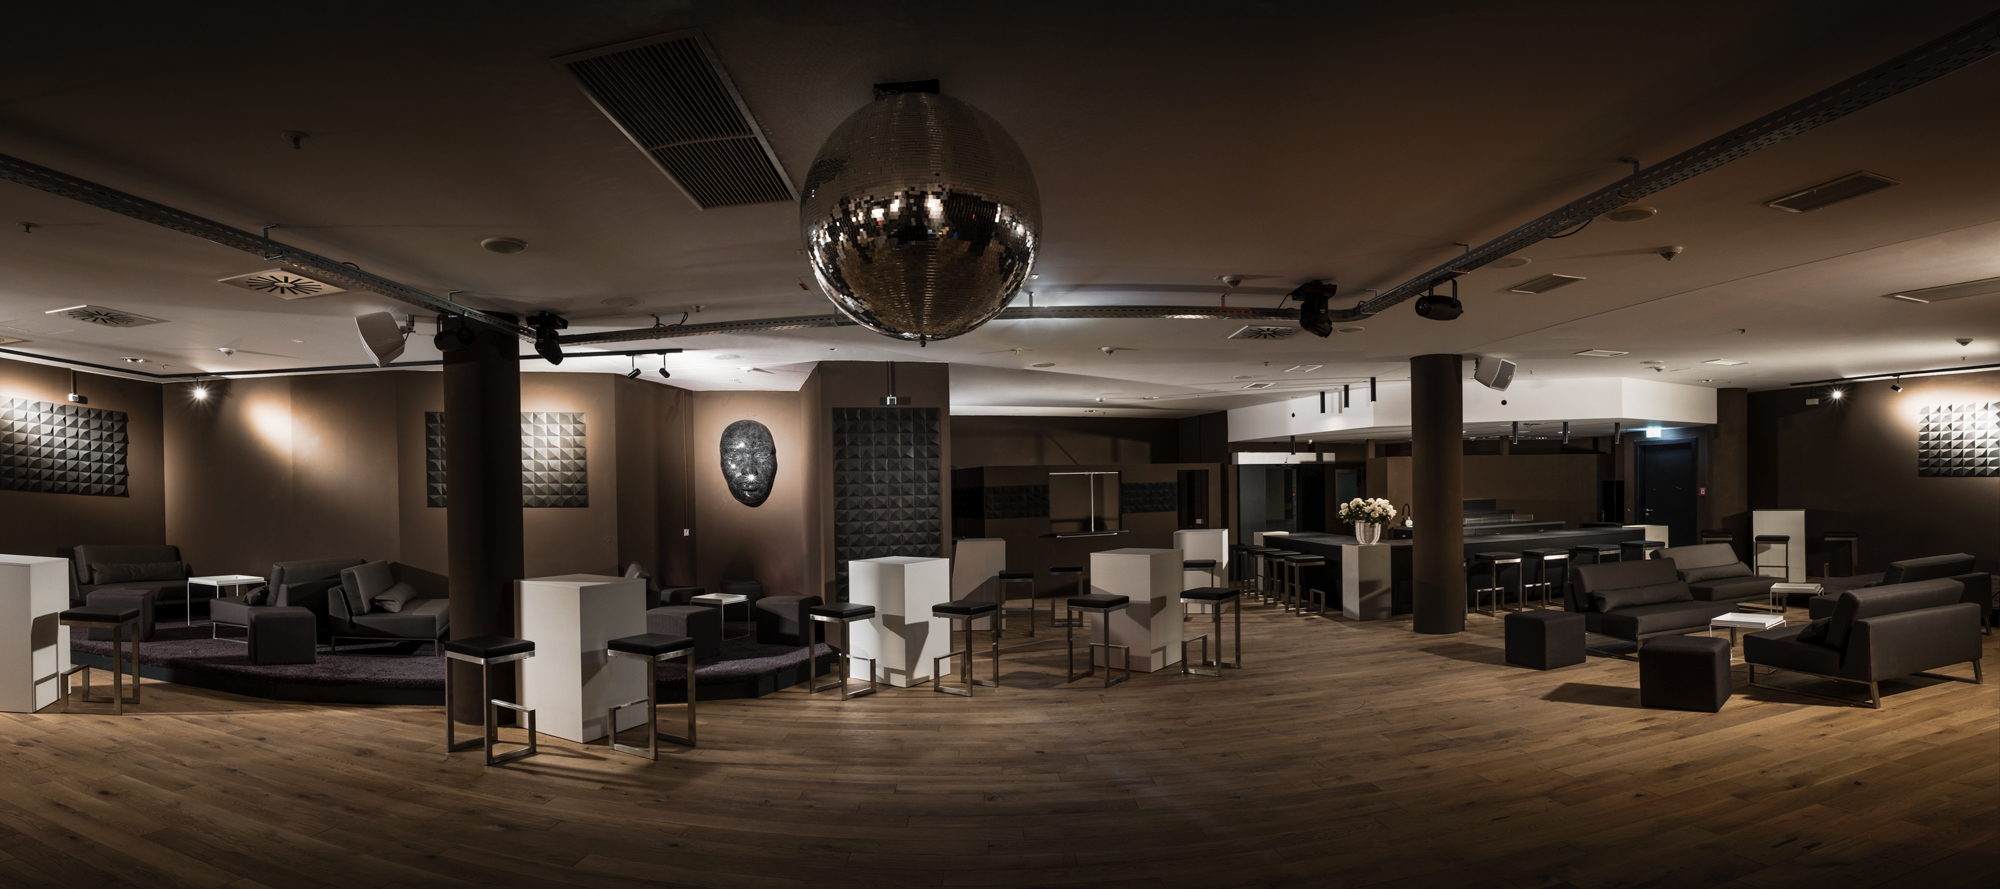 copper room event location pop up restaurant frankfurt